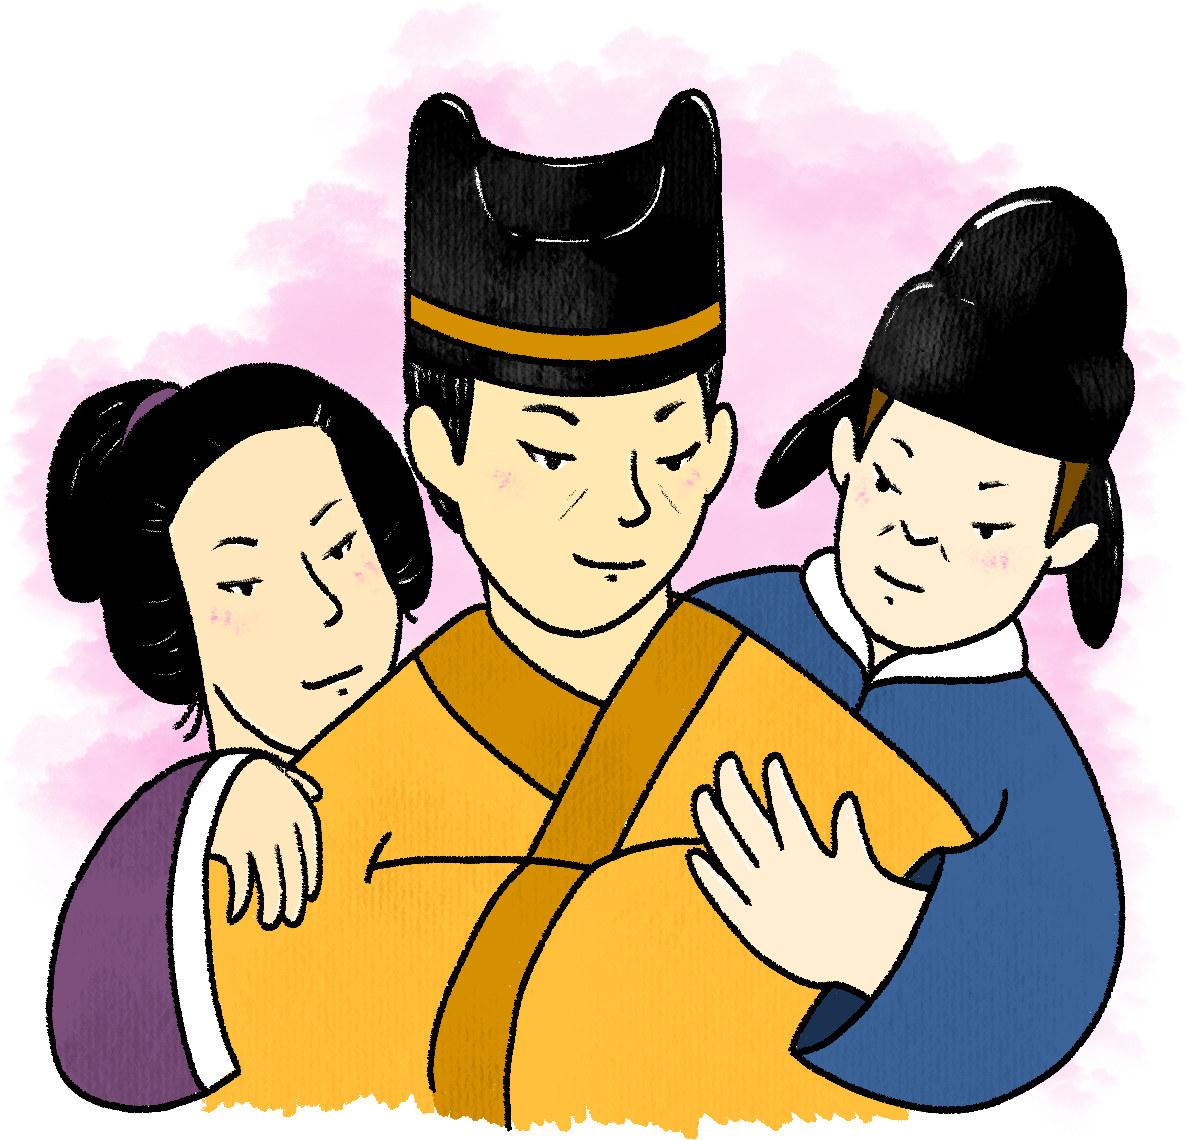 Emperor figure in the center with eunuchs draped over them